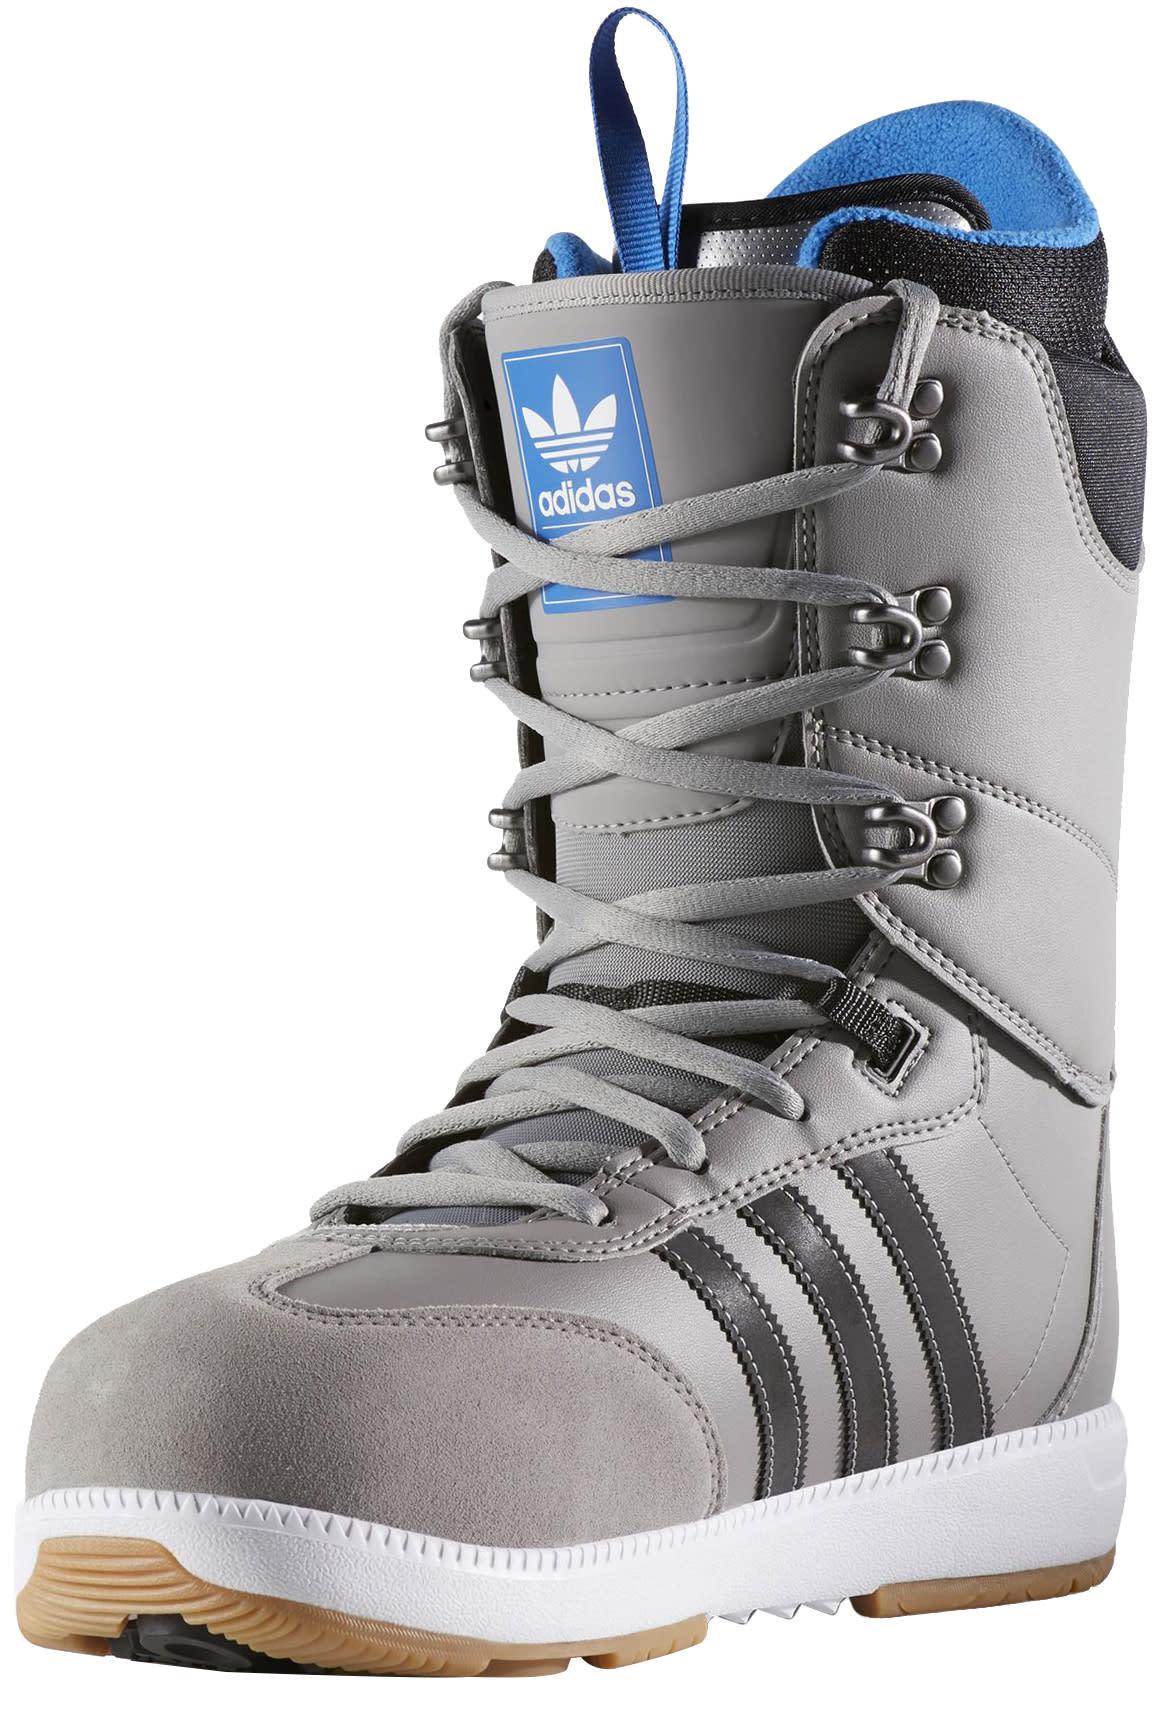 0d5aa3b48343 Adidas Samba Adv Snowboard Boots - thumbnail 2